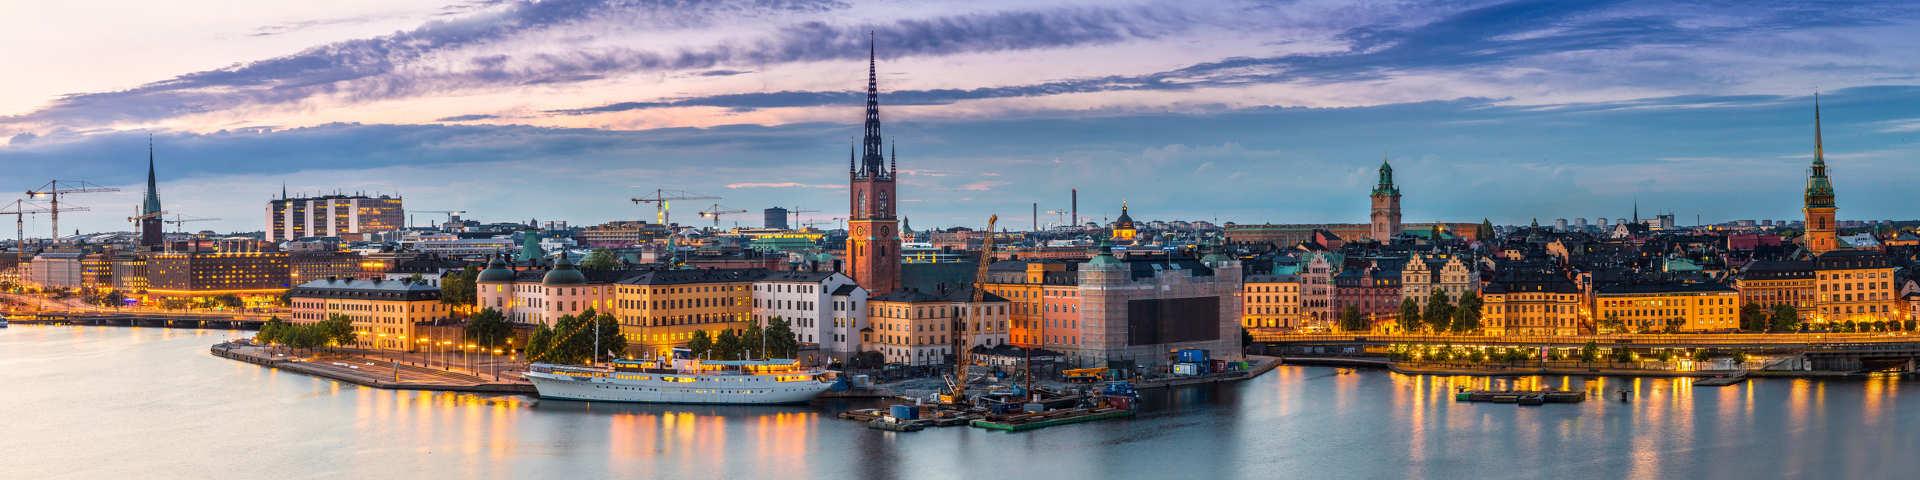 Stockholm hero banner